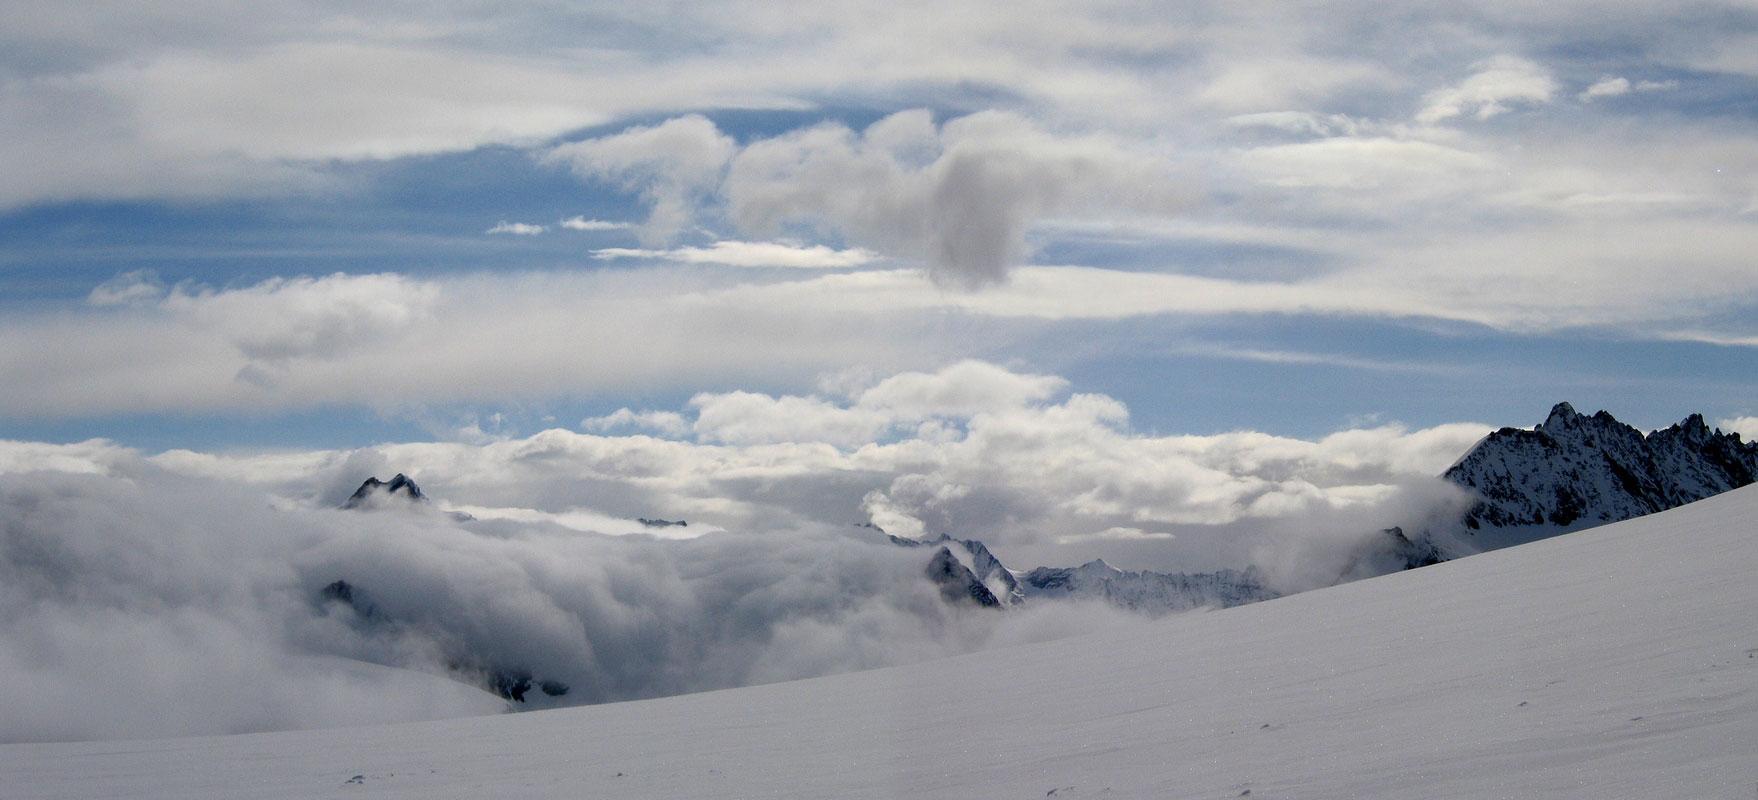 Pigne Arolla, Day 5 H.R. Chamonix-Zermatt Walliser Alpen / Alpes valaisannes Švýcarsko panorama 41